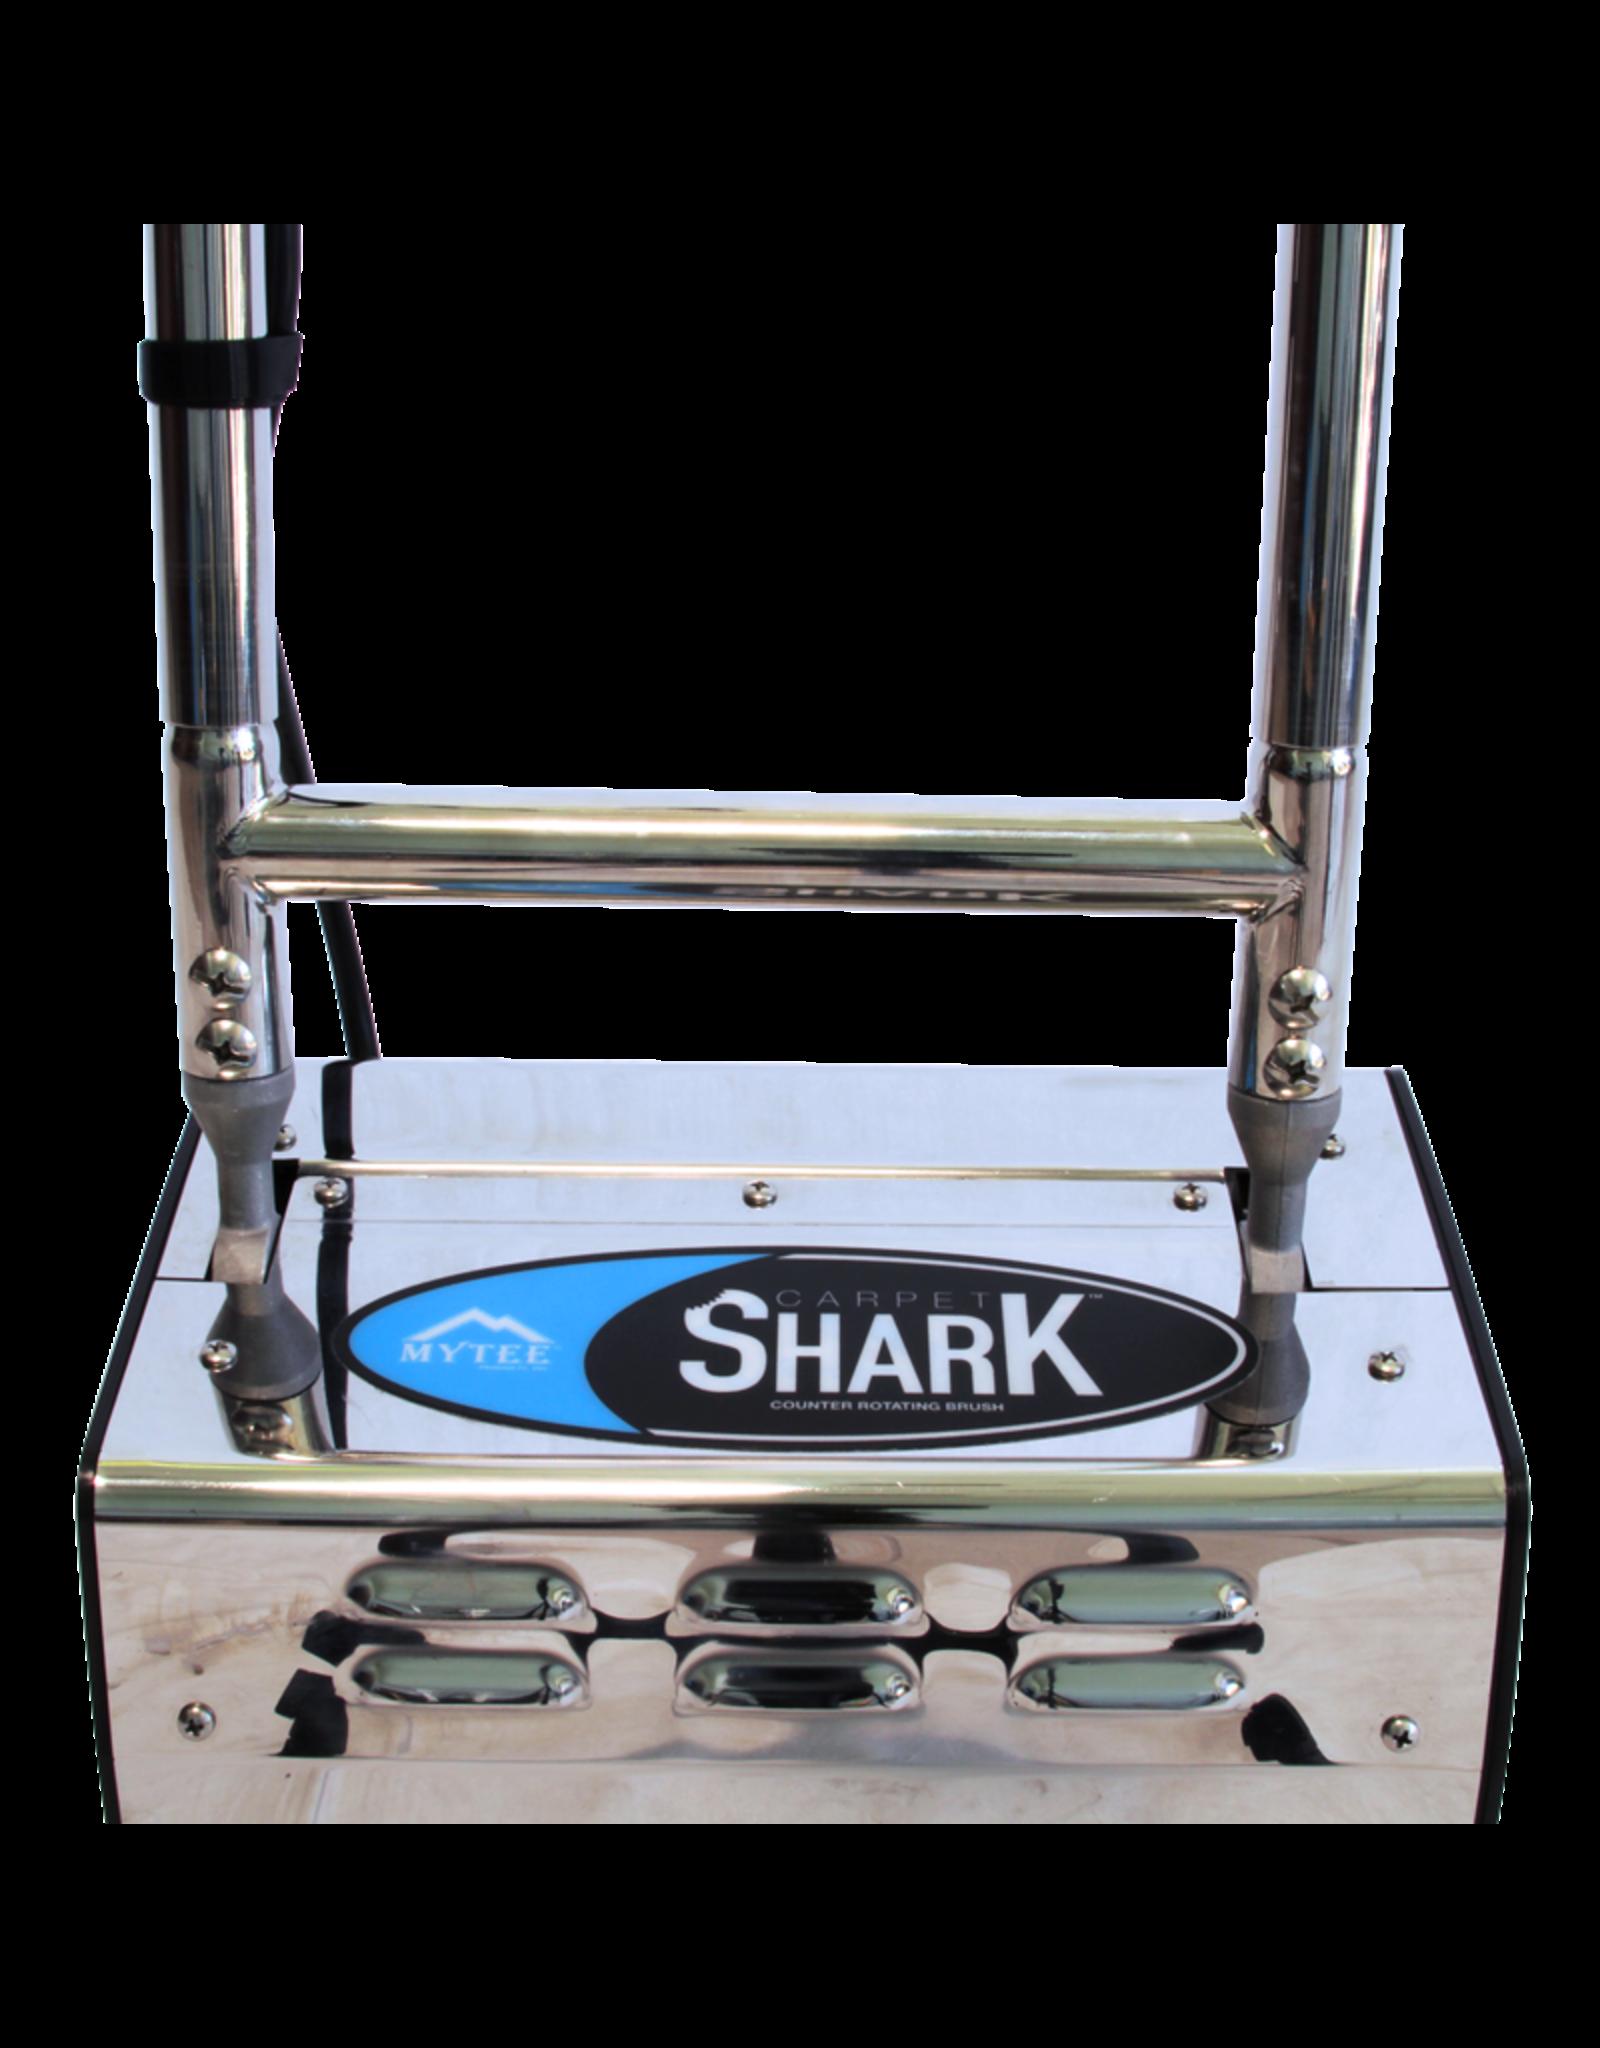 "Mytee CRB3017 Carpet Shark 17"" Counter Rotating Brush"